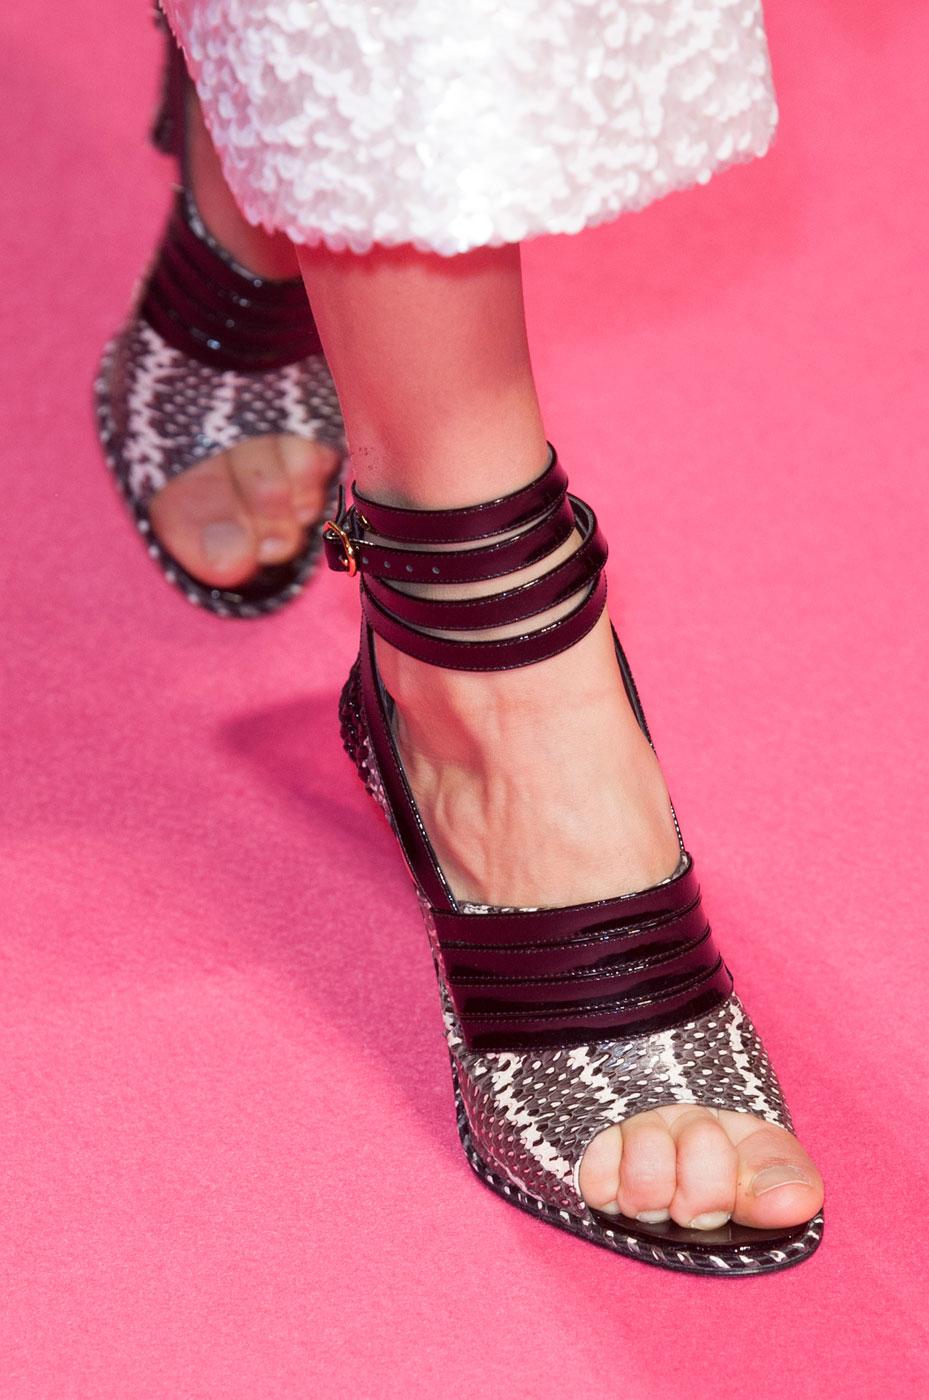 Schiaparelli-fashion-runway-show-close-ups-haute-couture-paris-spring-summer-2015-the-impression-05